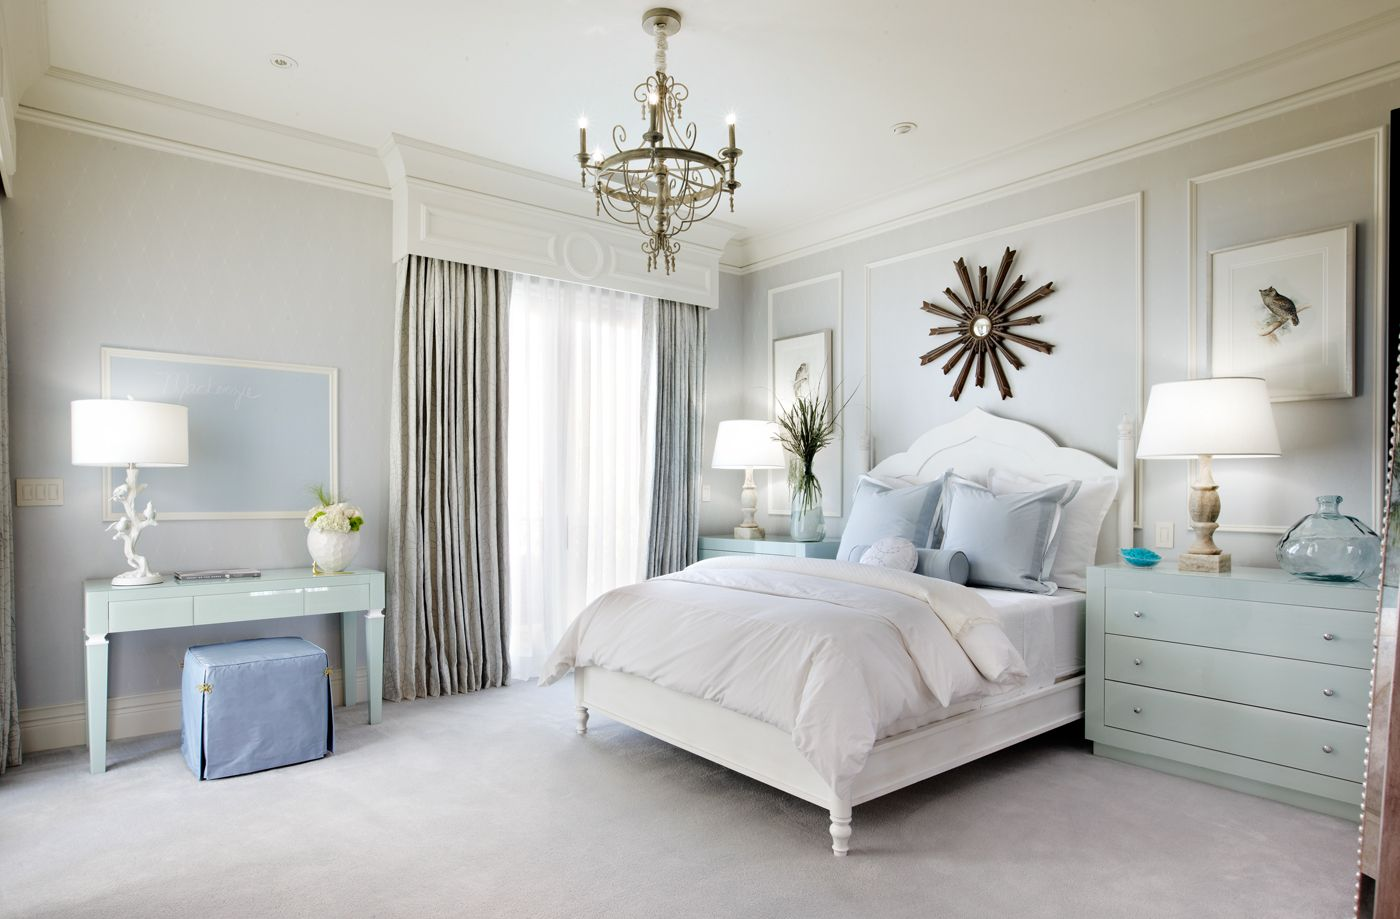 Blue And White Bedroom Design Impressive Tara Dudley Interiors  Wwwtaradudleyinteriors  Luxury Inspiration Design